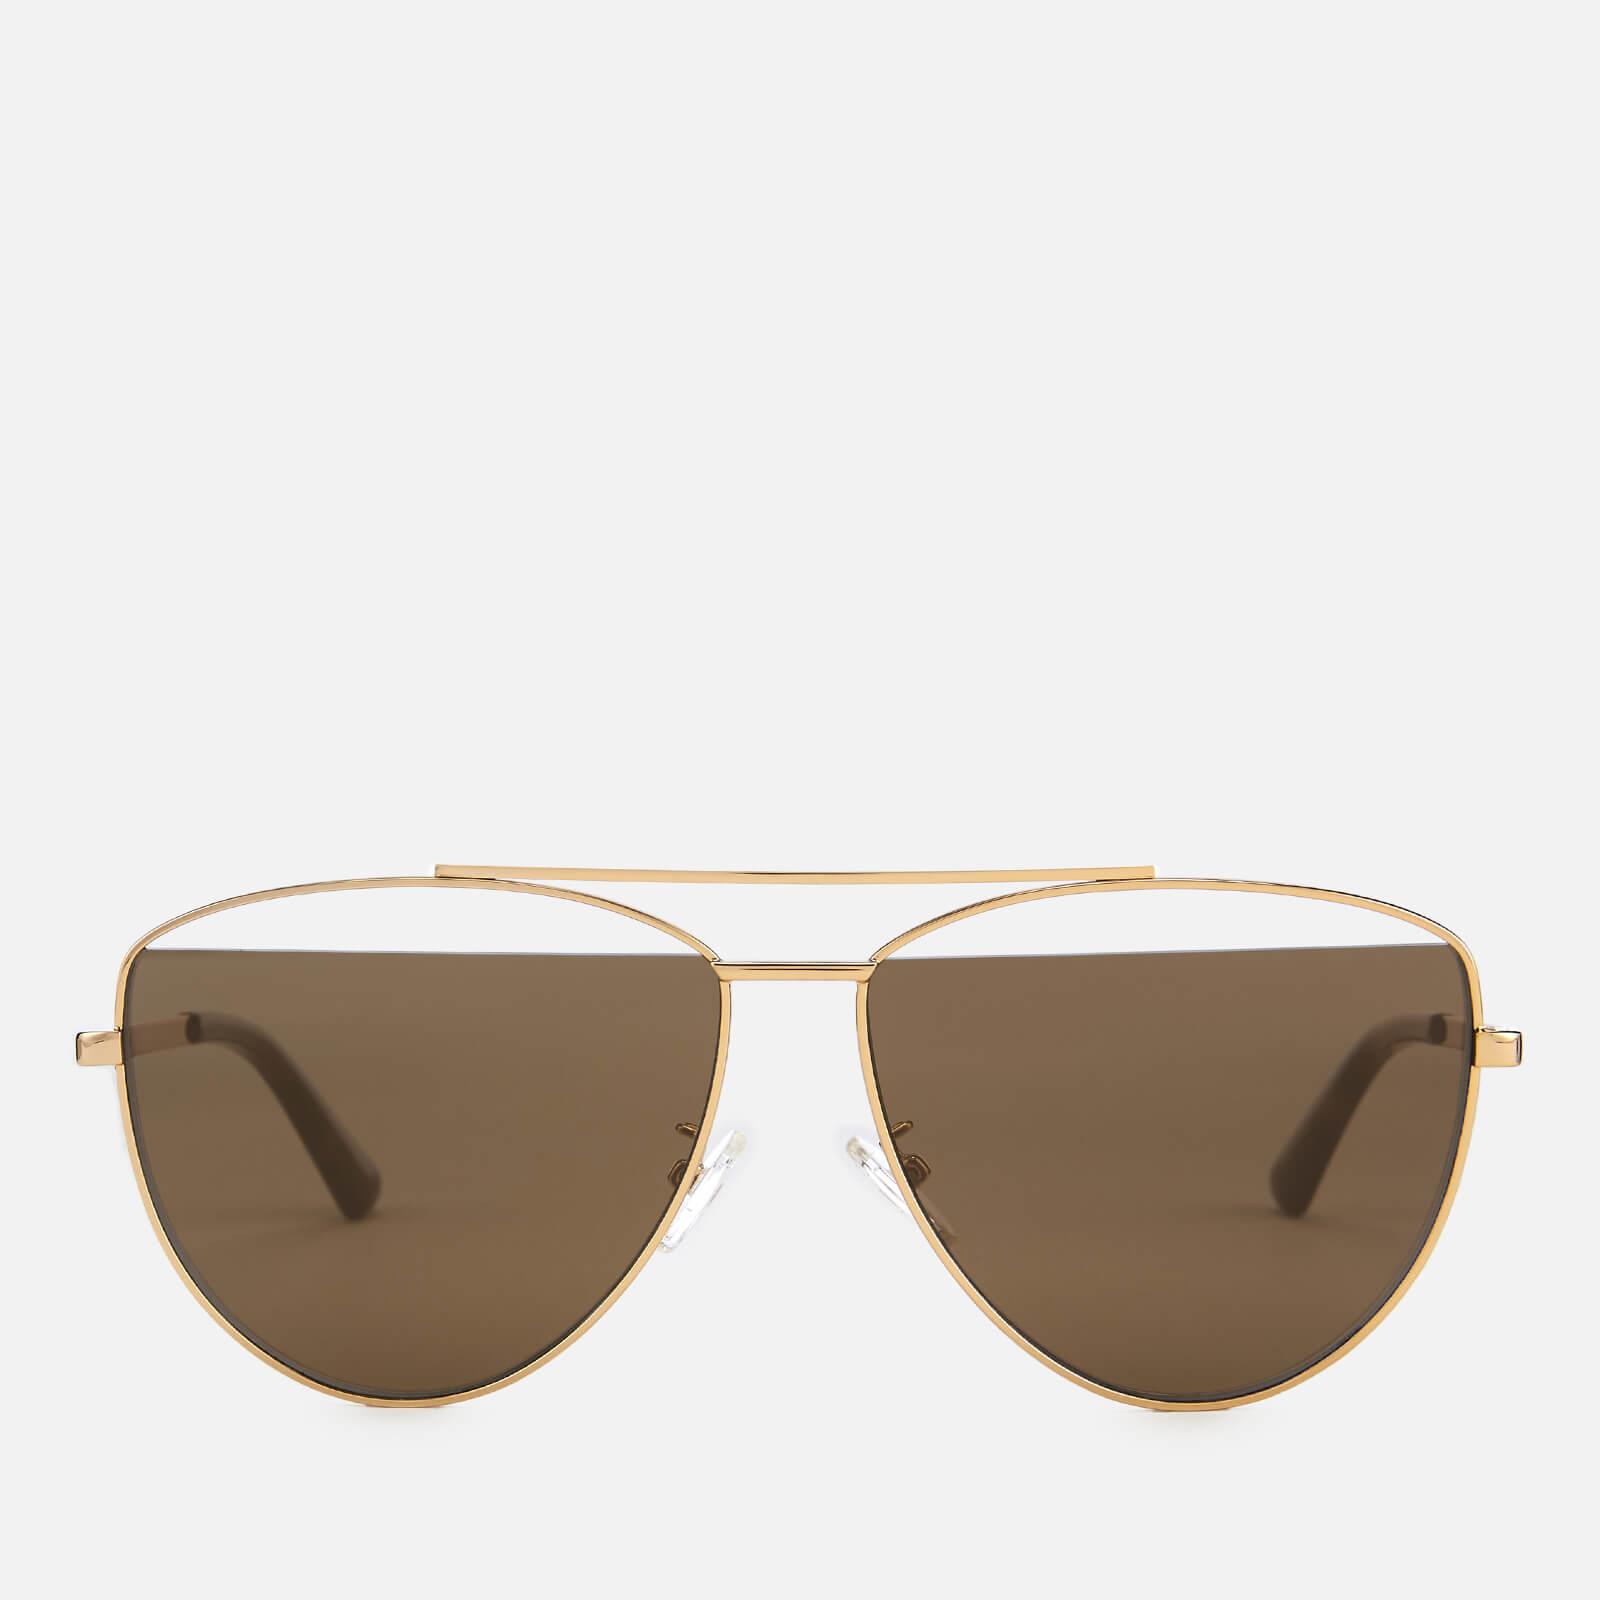 f9796687c2 McQ Alexander McQueen Women s Metal Aviator Style Sunglasses - Gold ...